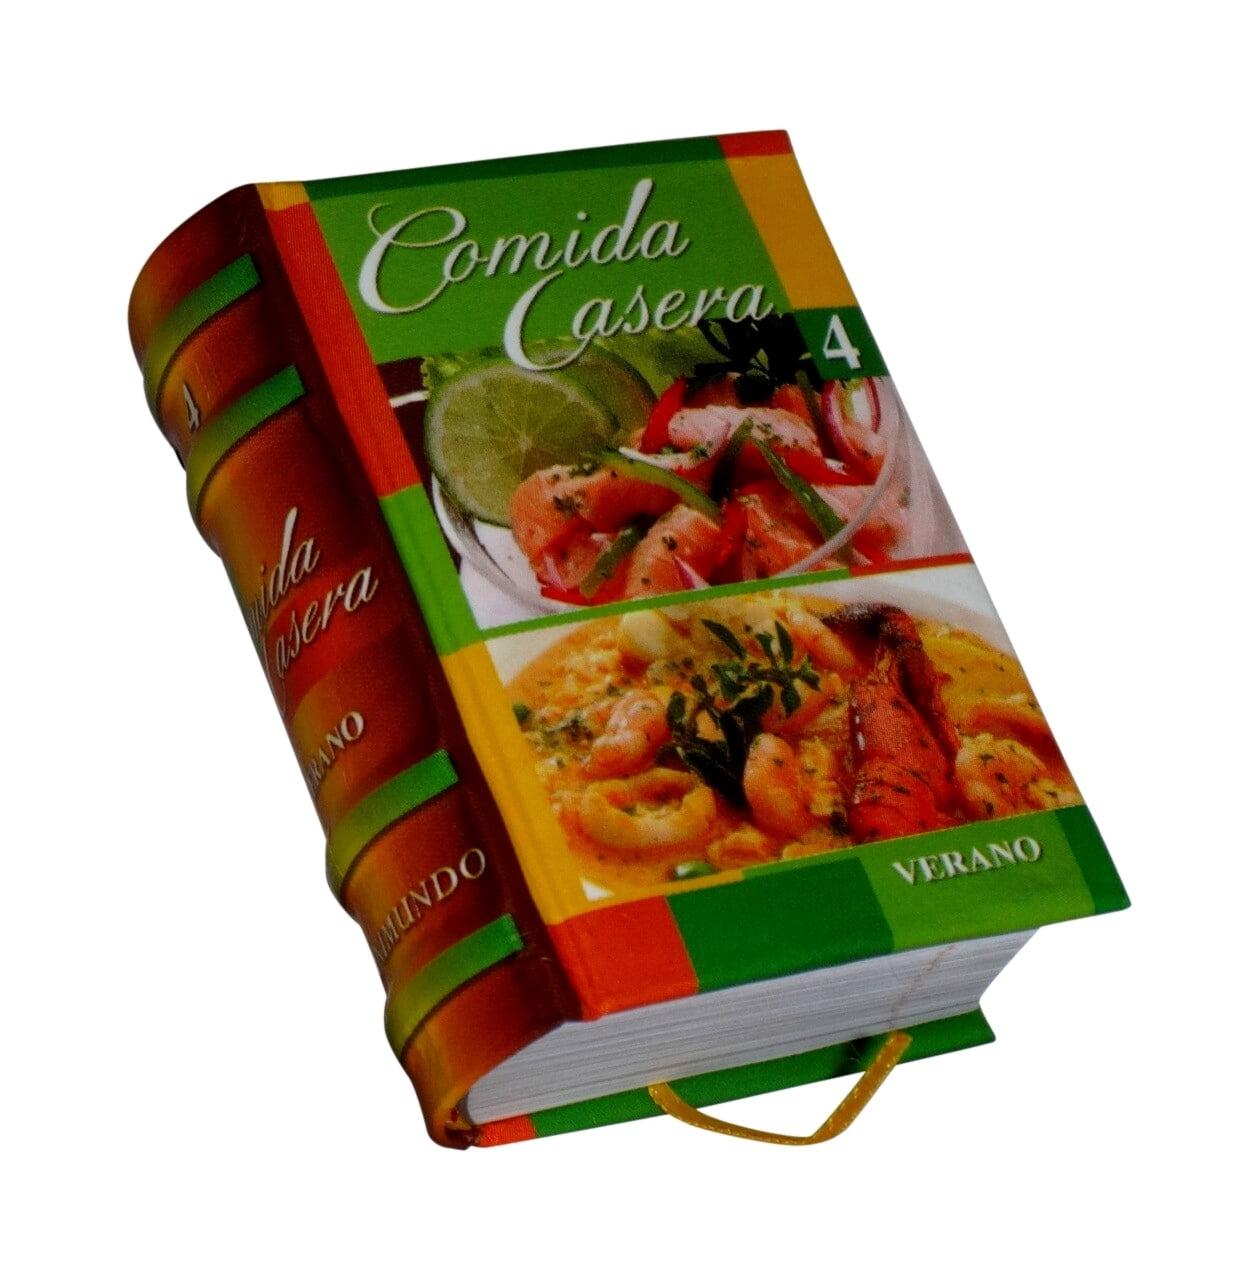 comida_casera-4-miniature-book-libro